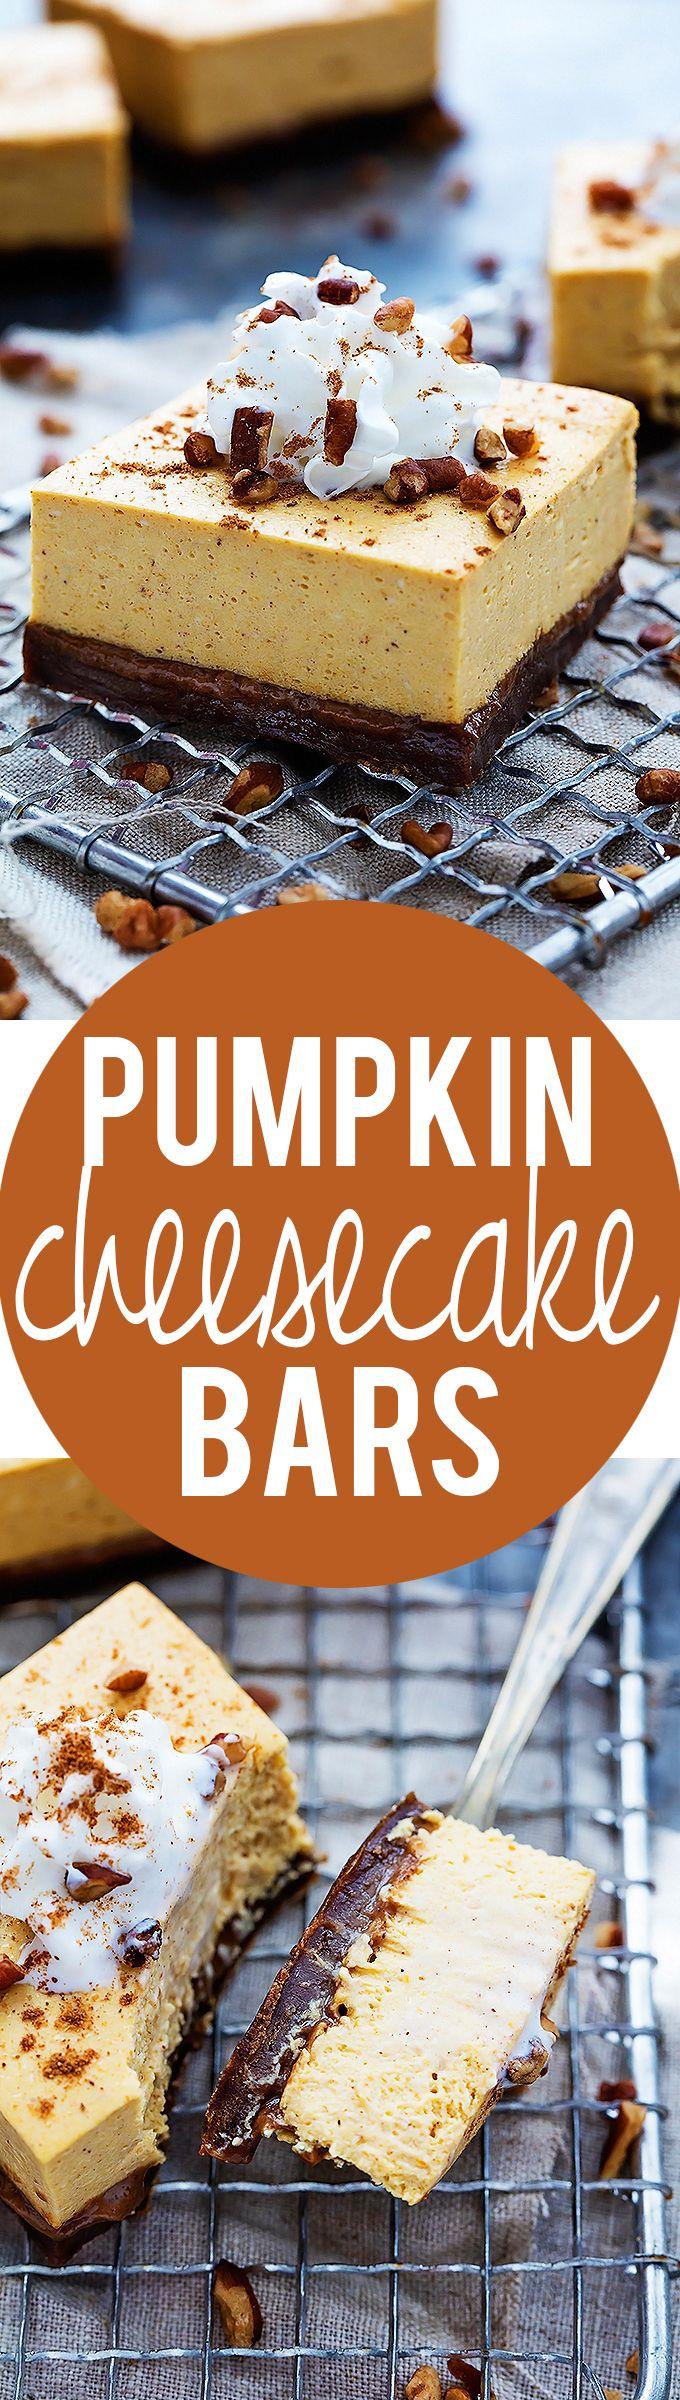 Pumpkin Cheesecake Bars with Gingersnap Crust | Creme de la Crumb